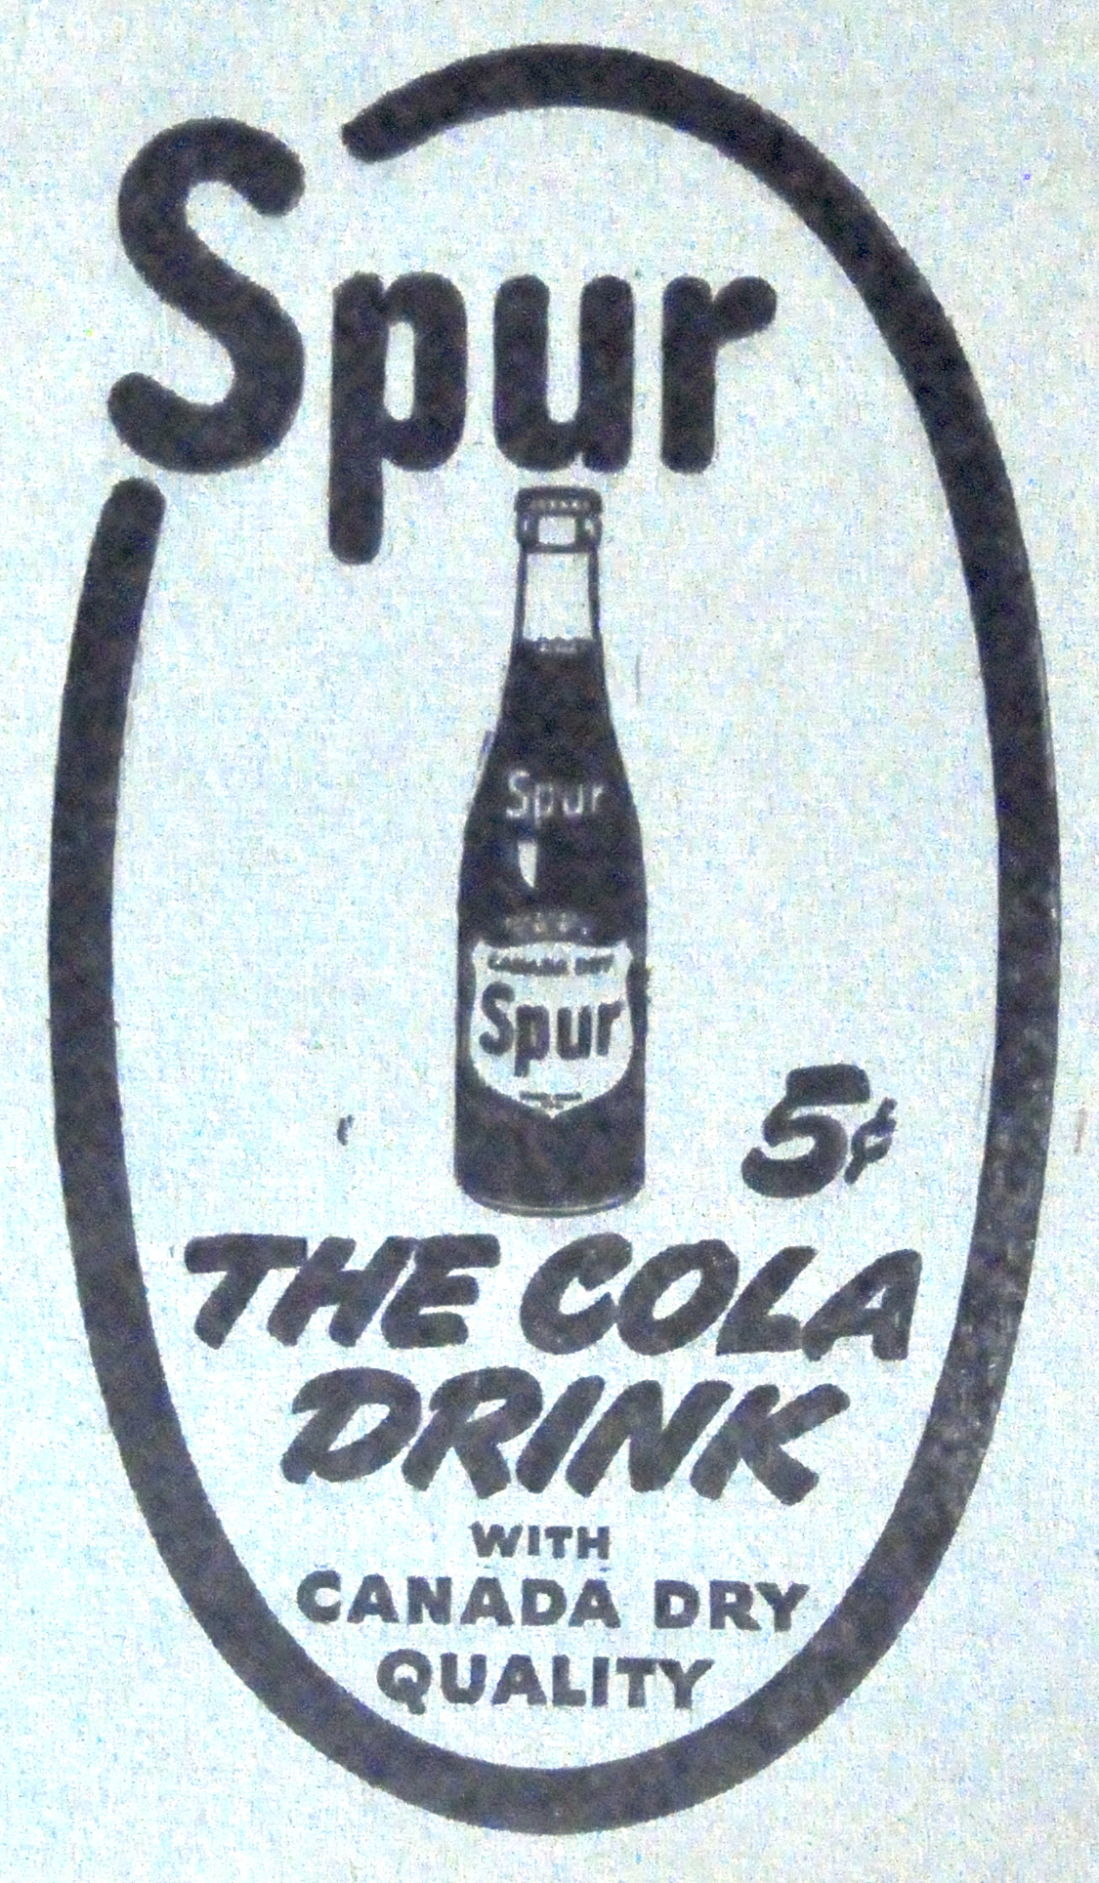 Spur cola